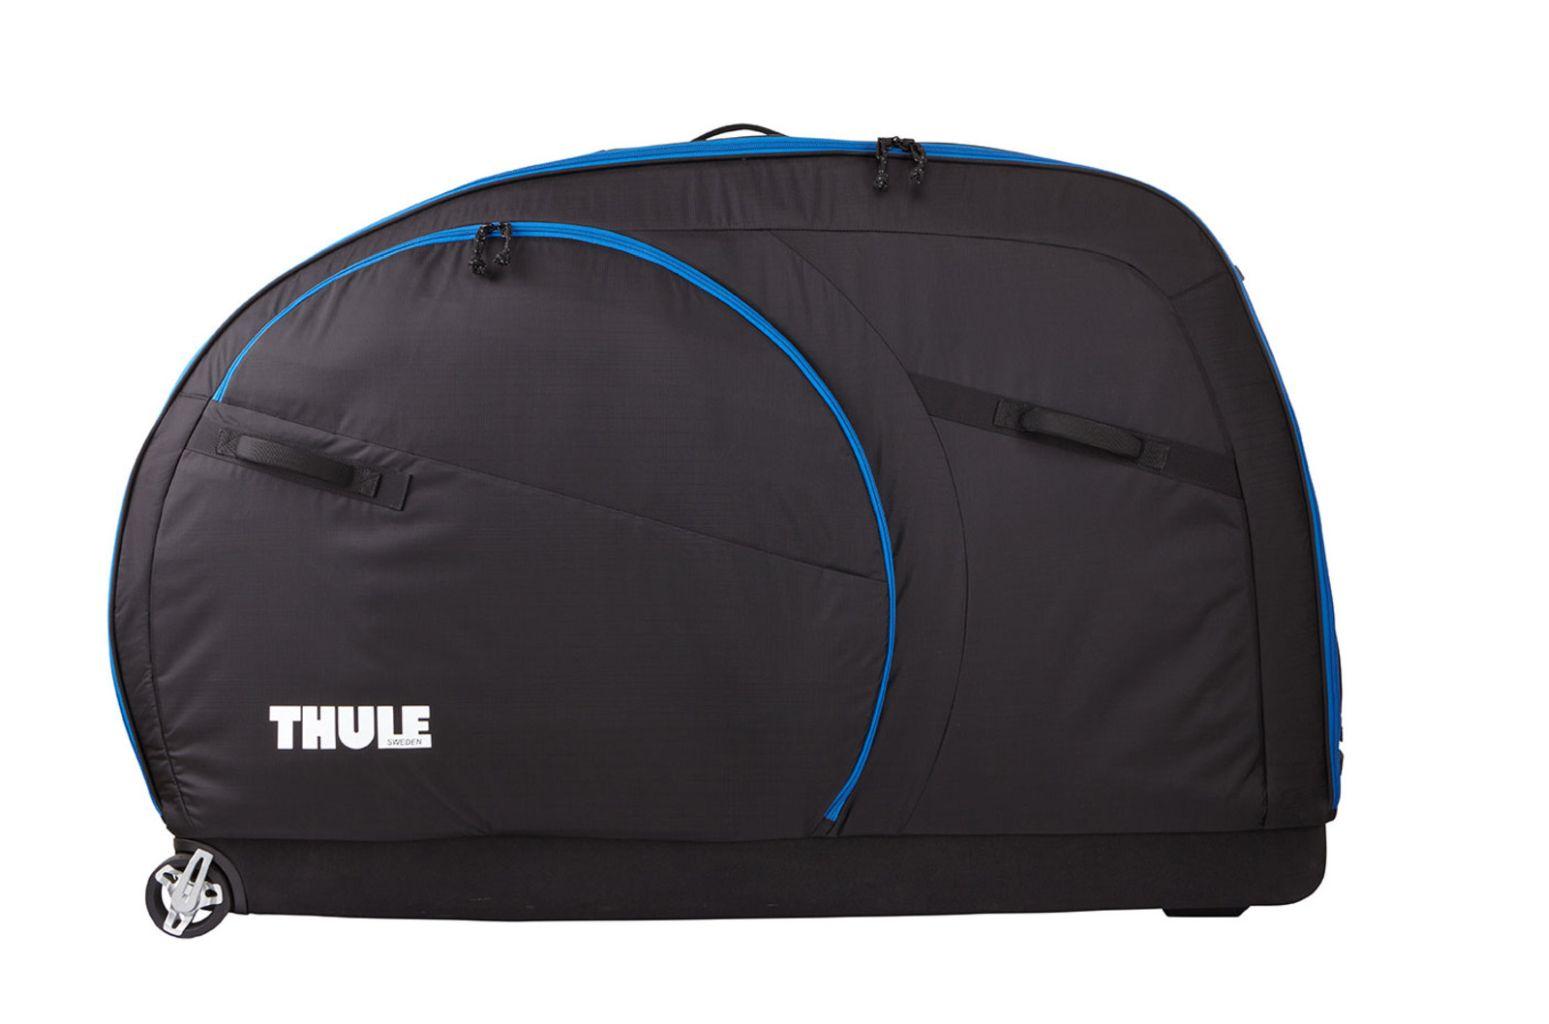 THULE RoundTrip Traveler Black/Cobalt-30